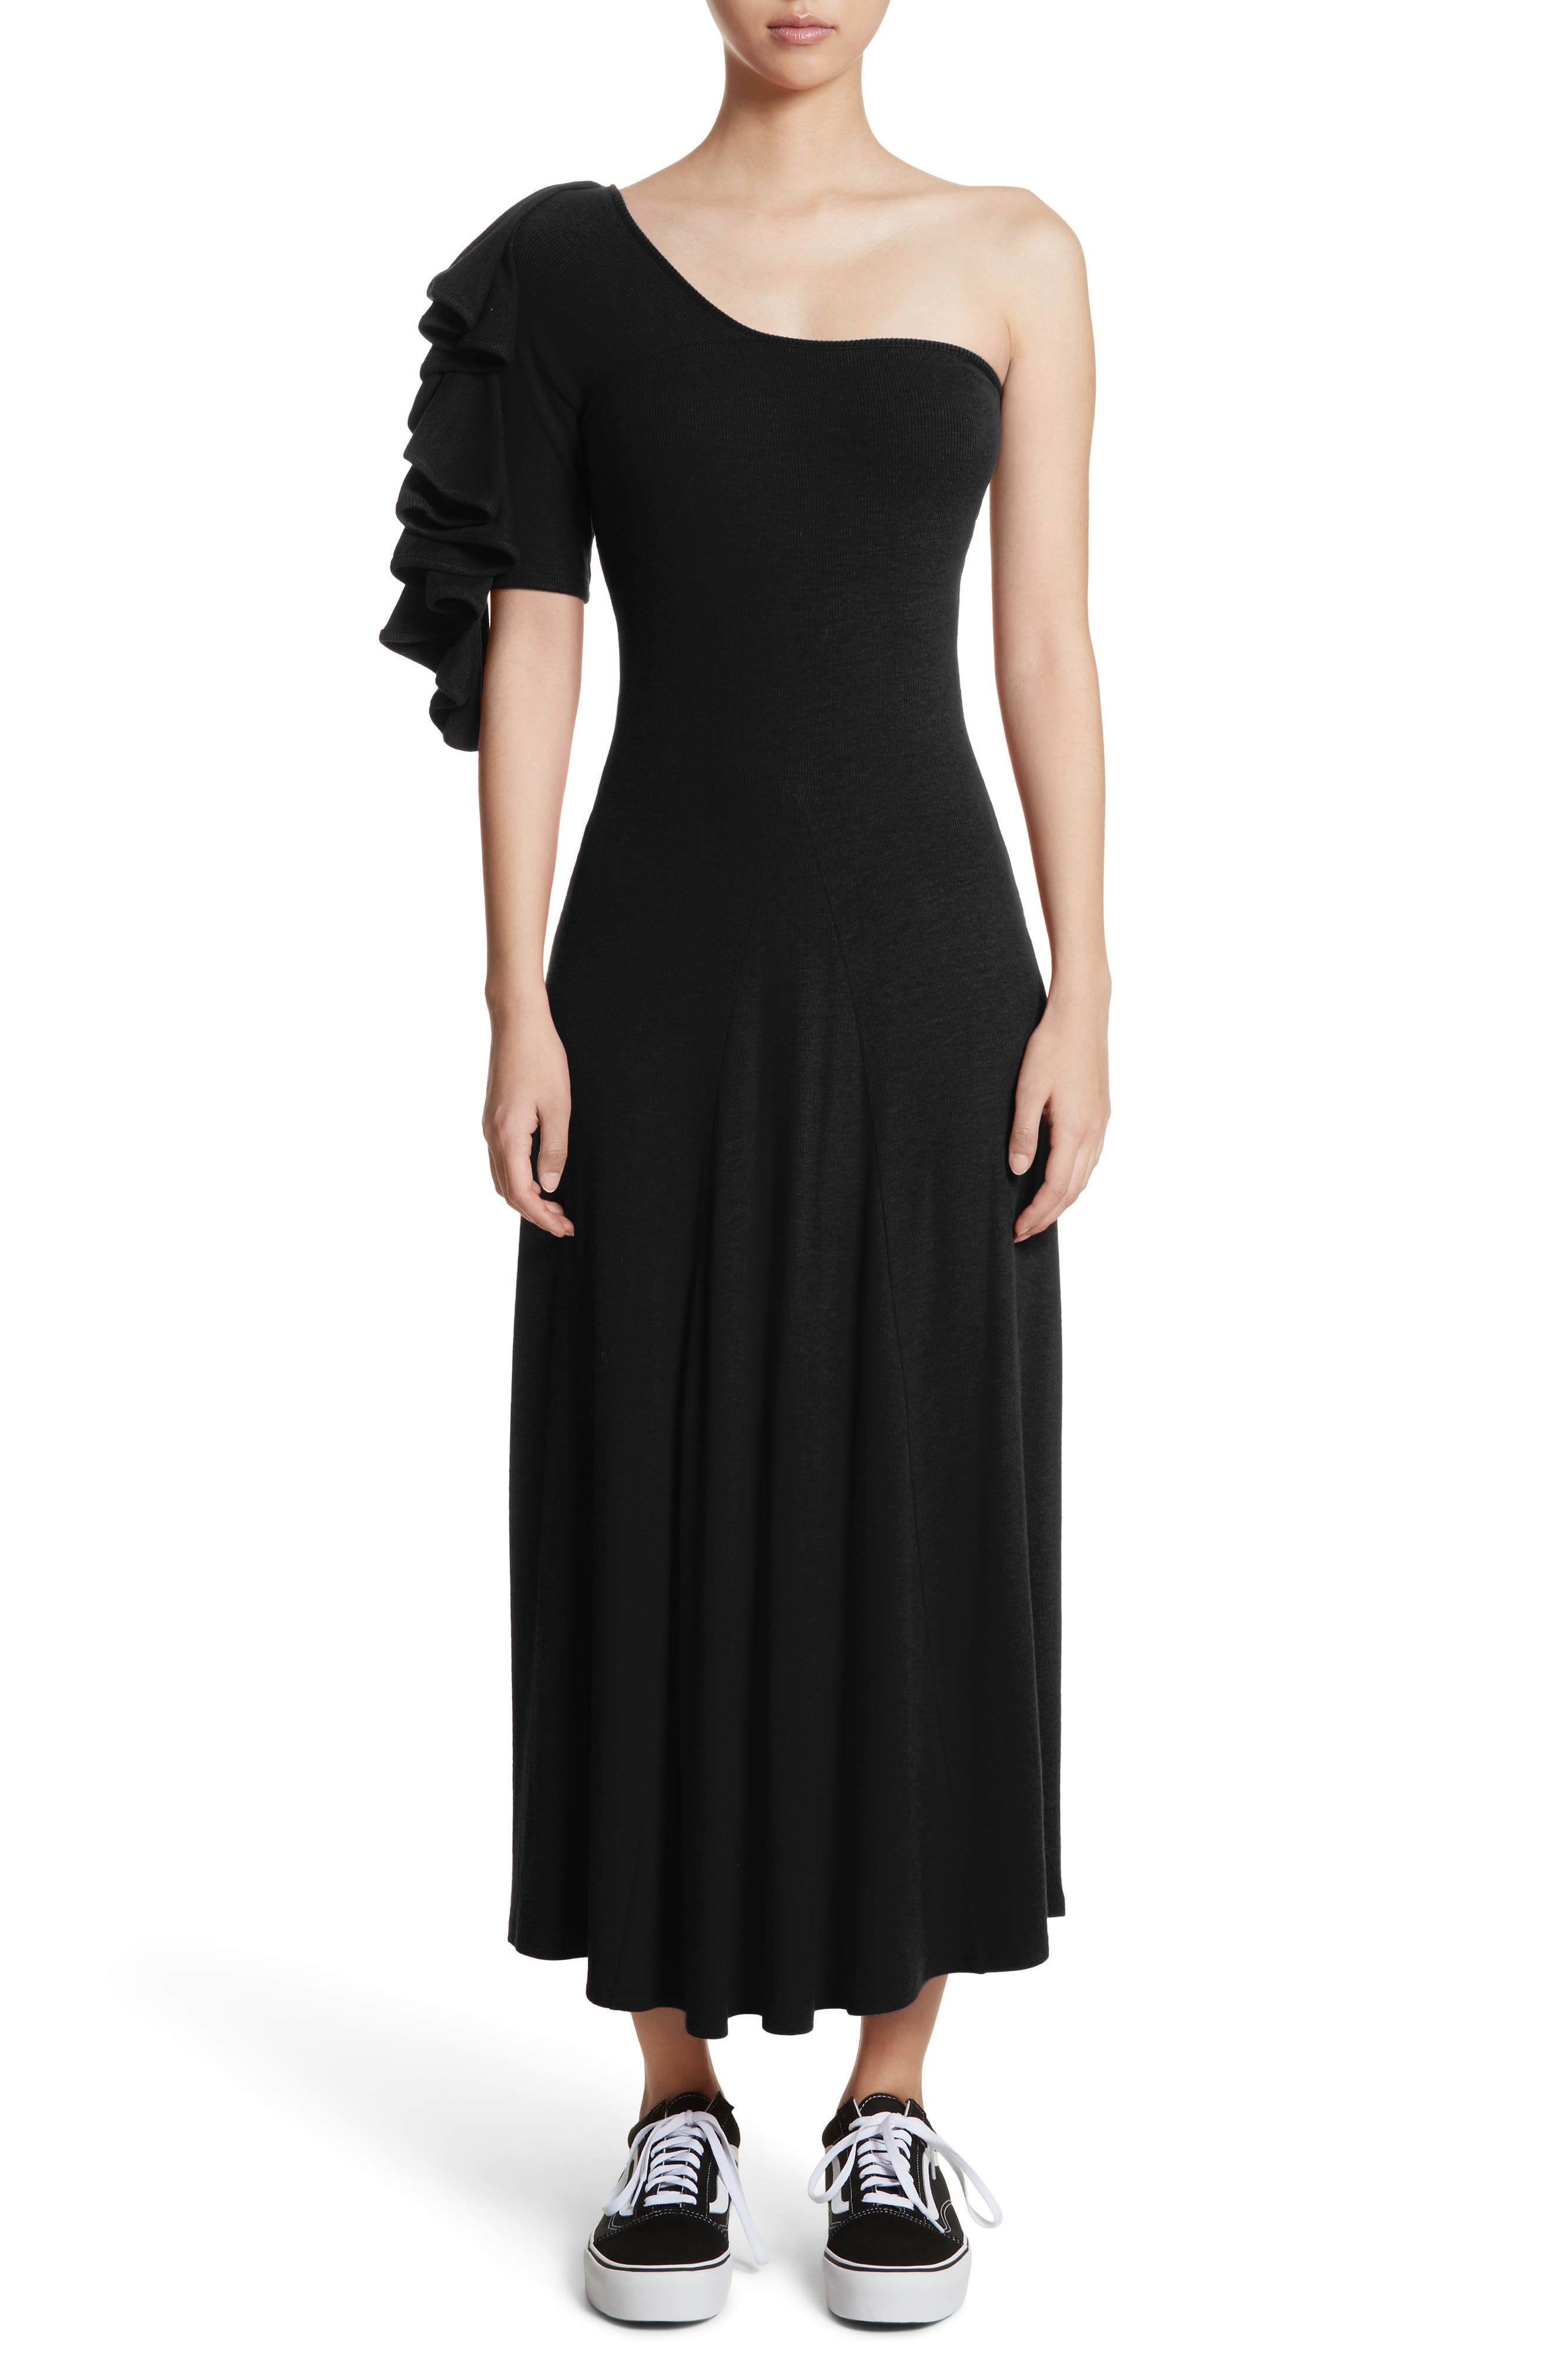 Dione One-Shoulder Dress,                             Main thumbnail 1, color,                             Black